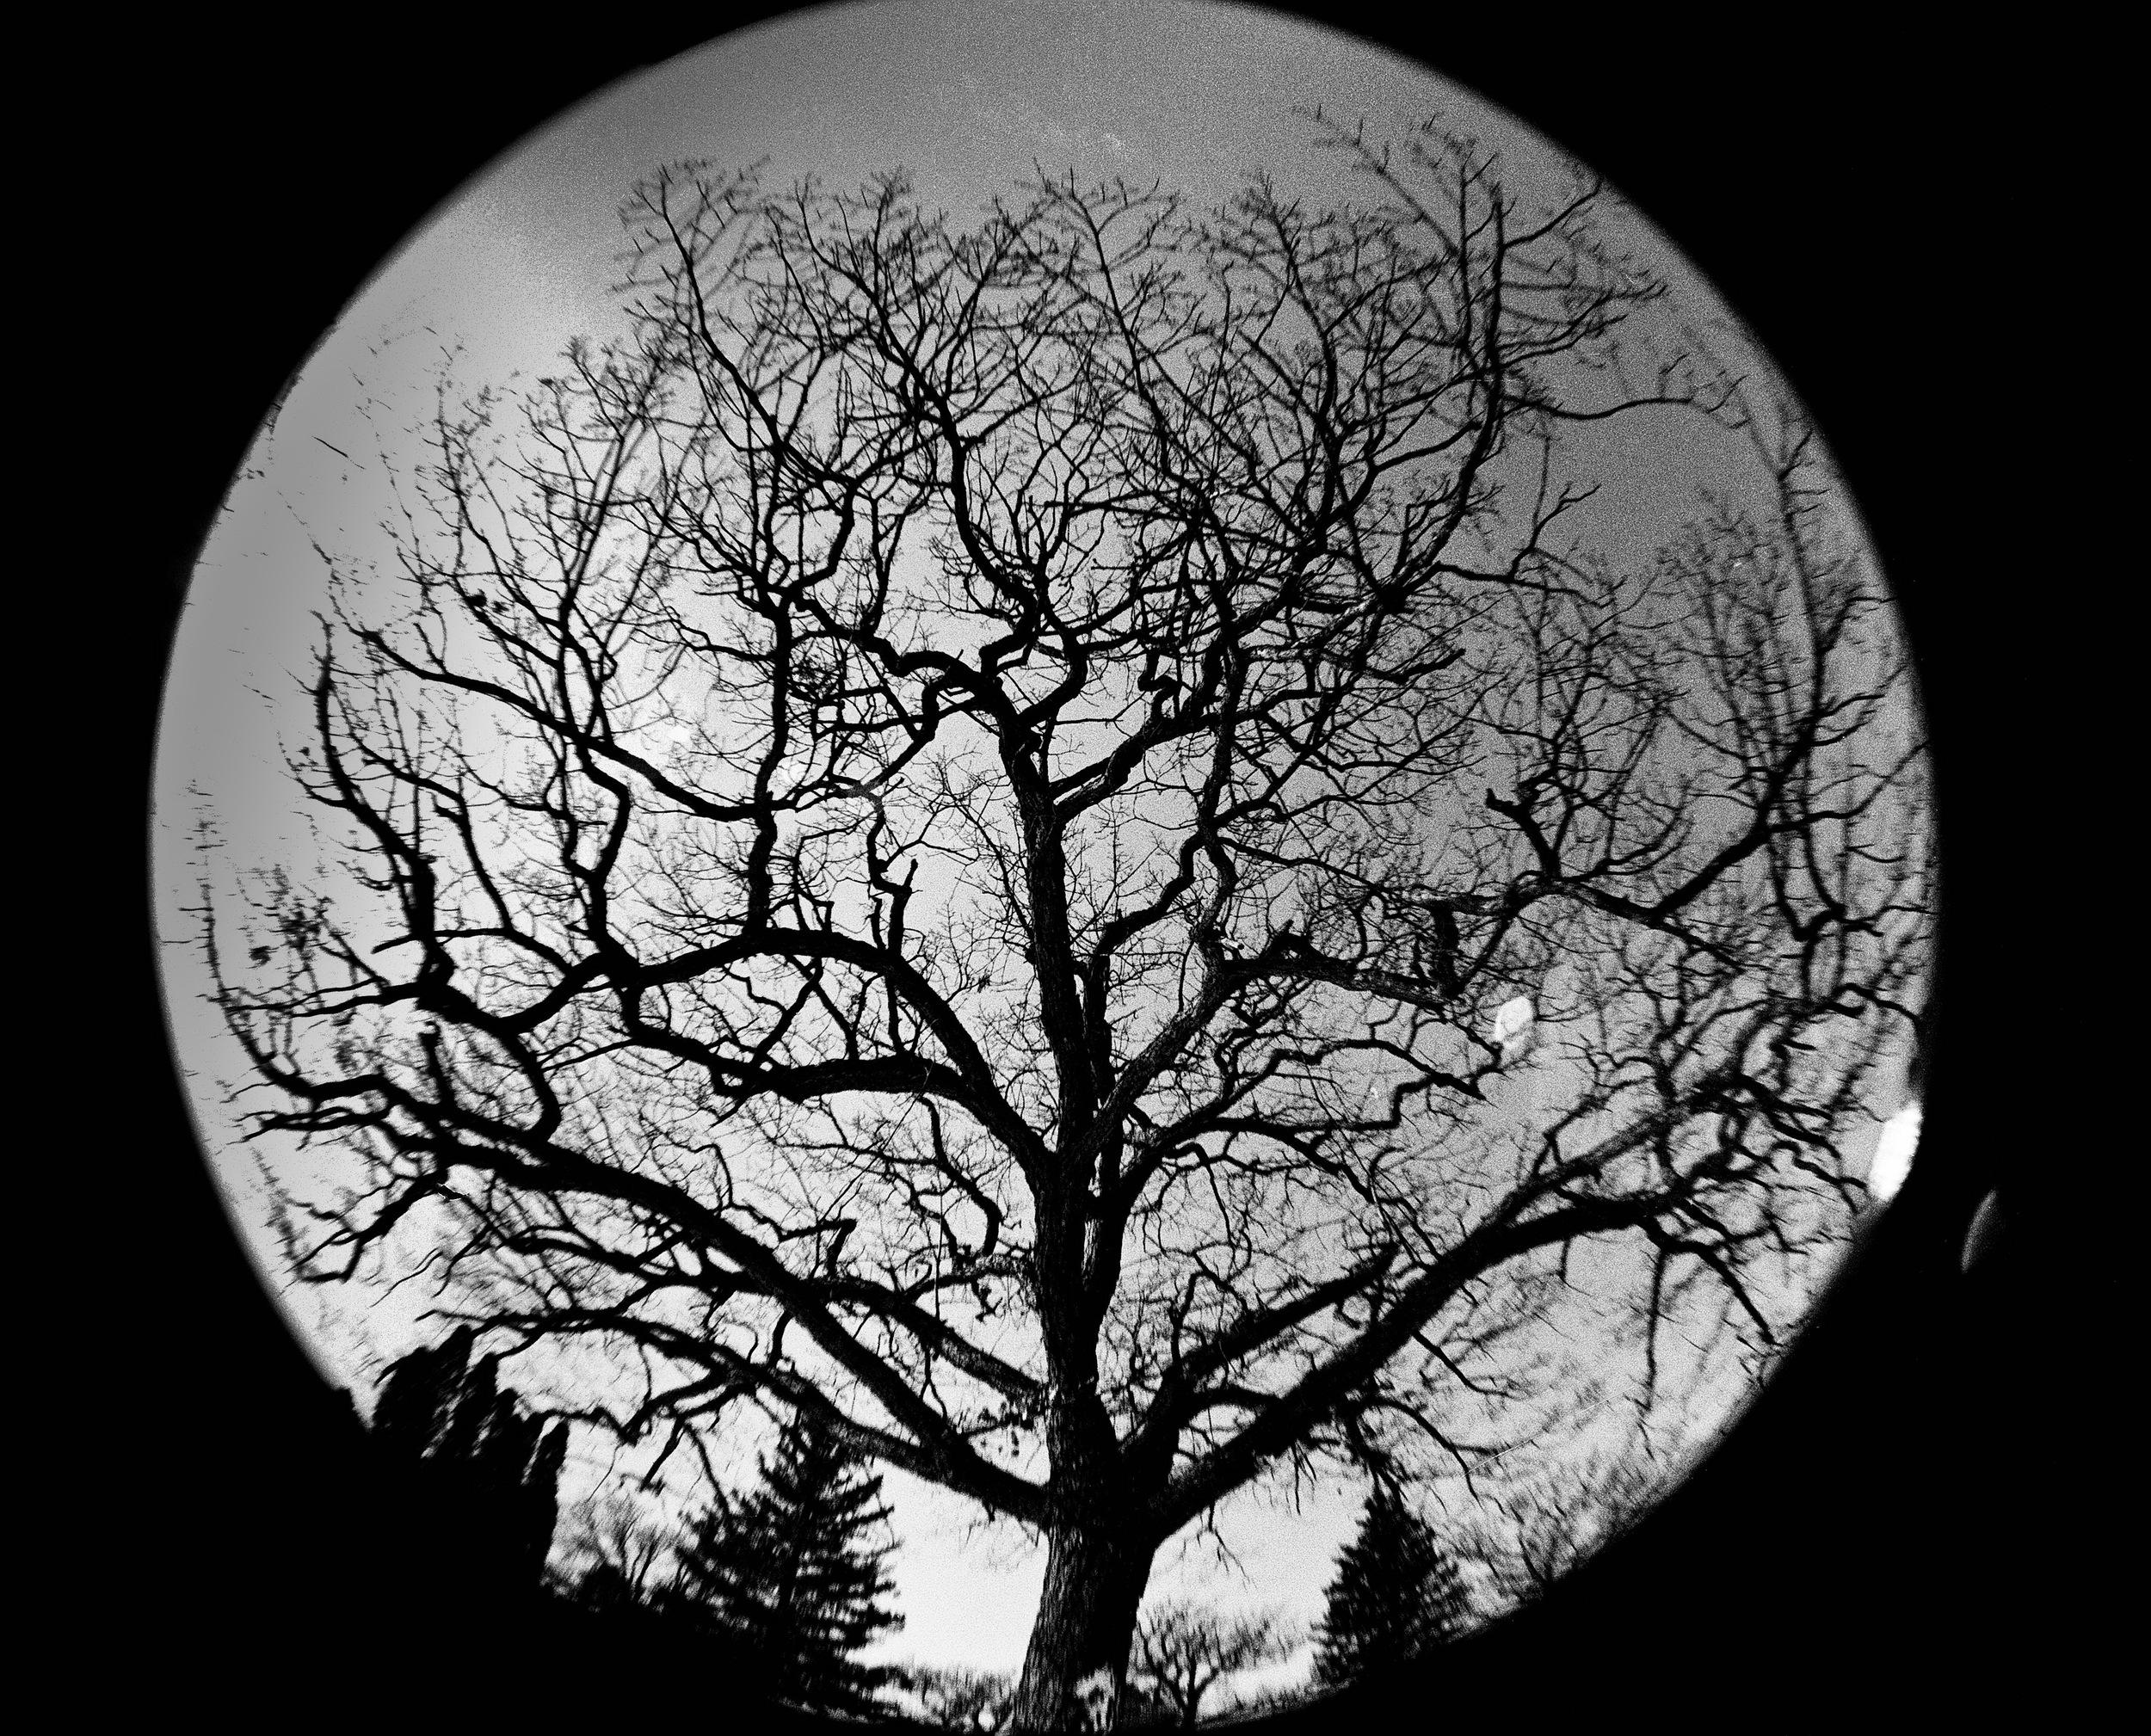 Phalen Tree, Fisheye View (1 of 1).jpg